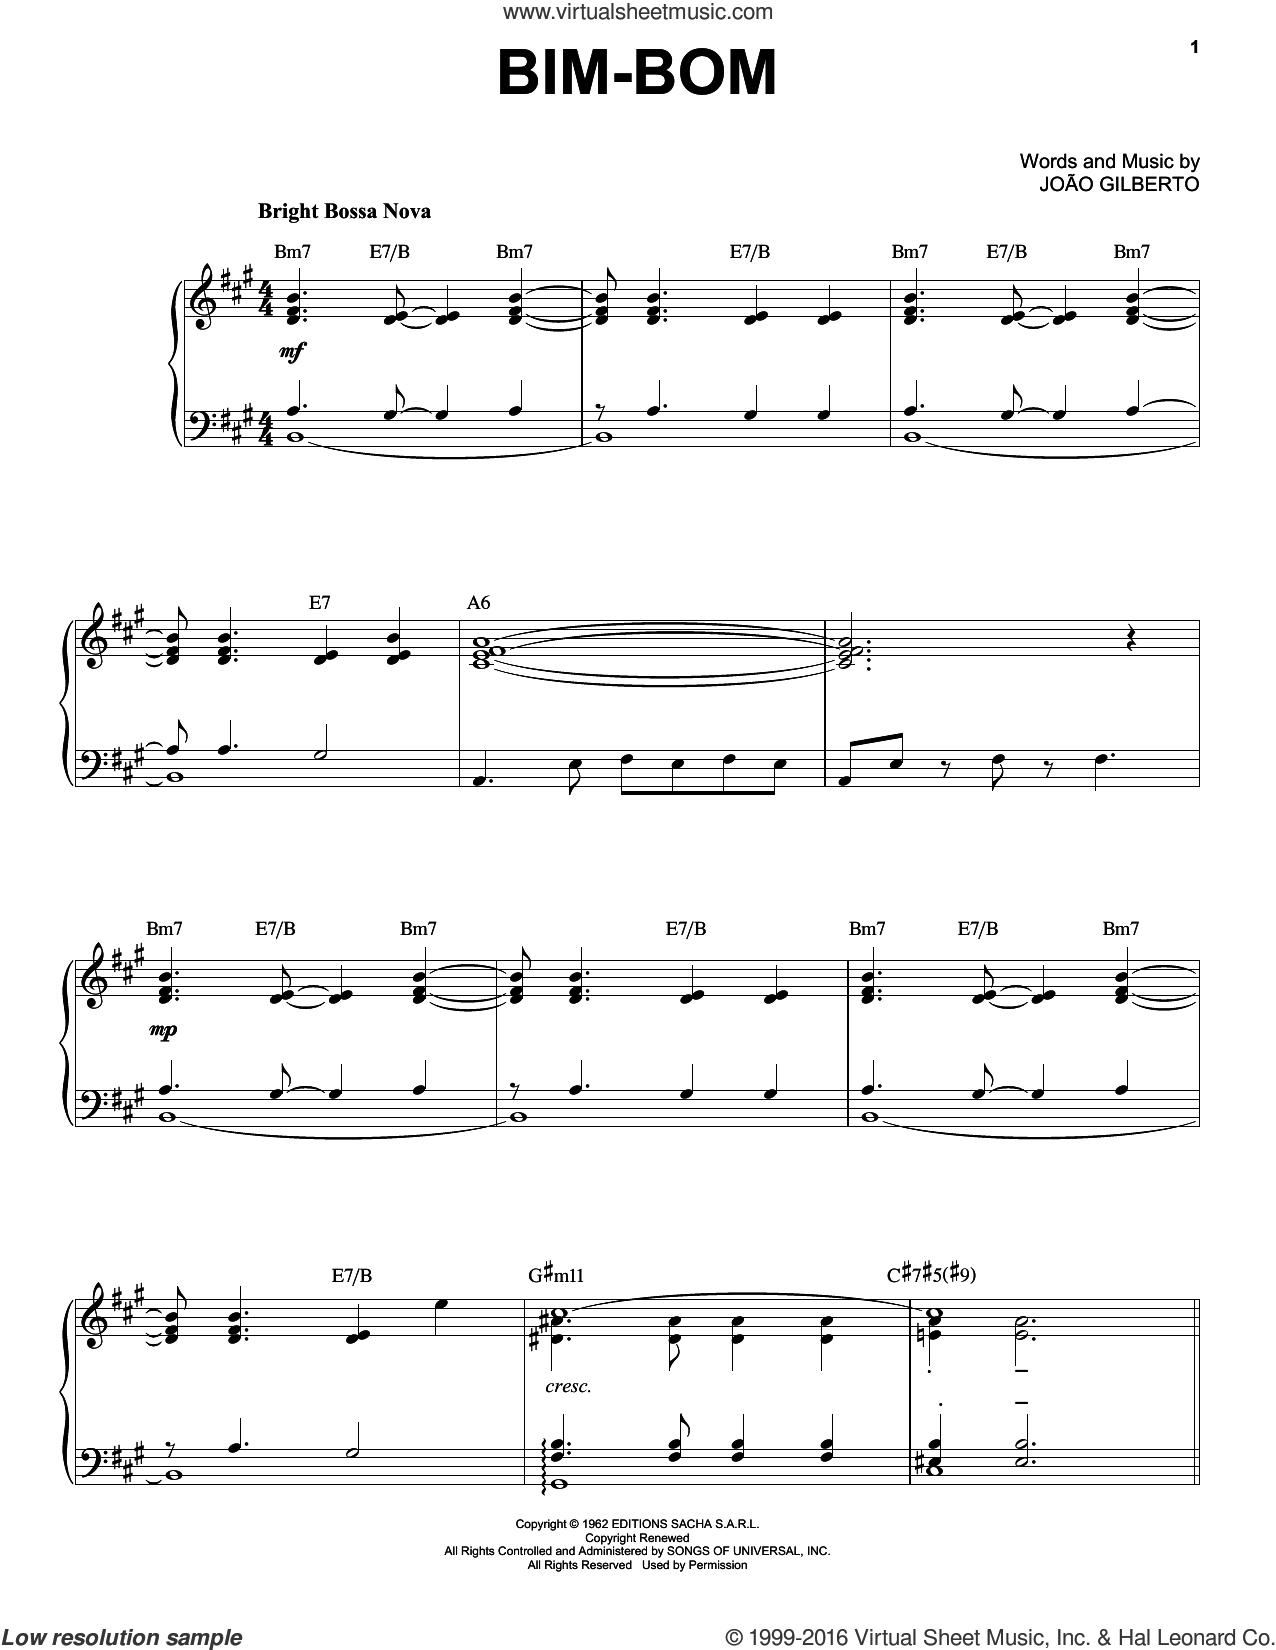 Bim-Bom sheet music for piano solo by Joao Gilberto, intermediate skill level